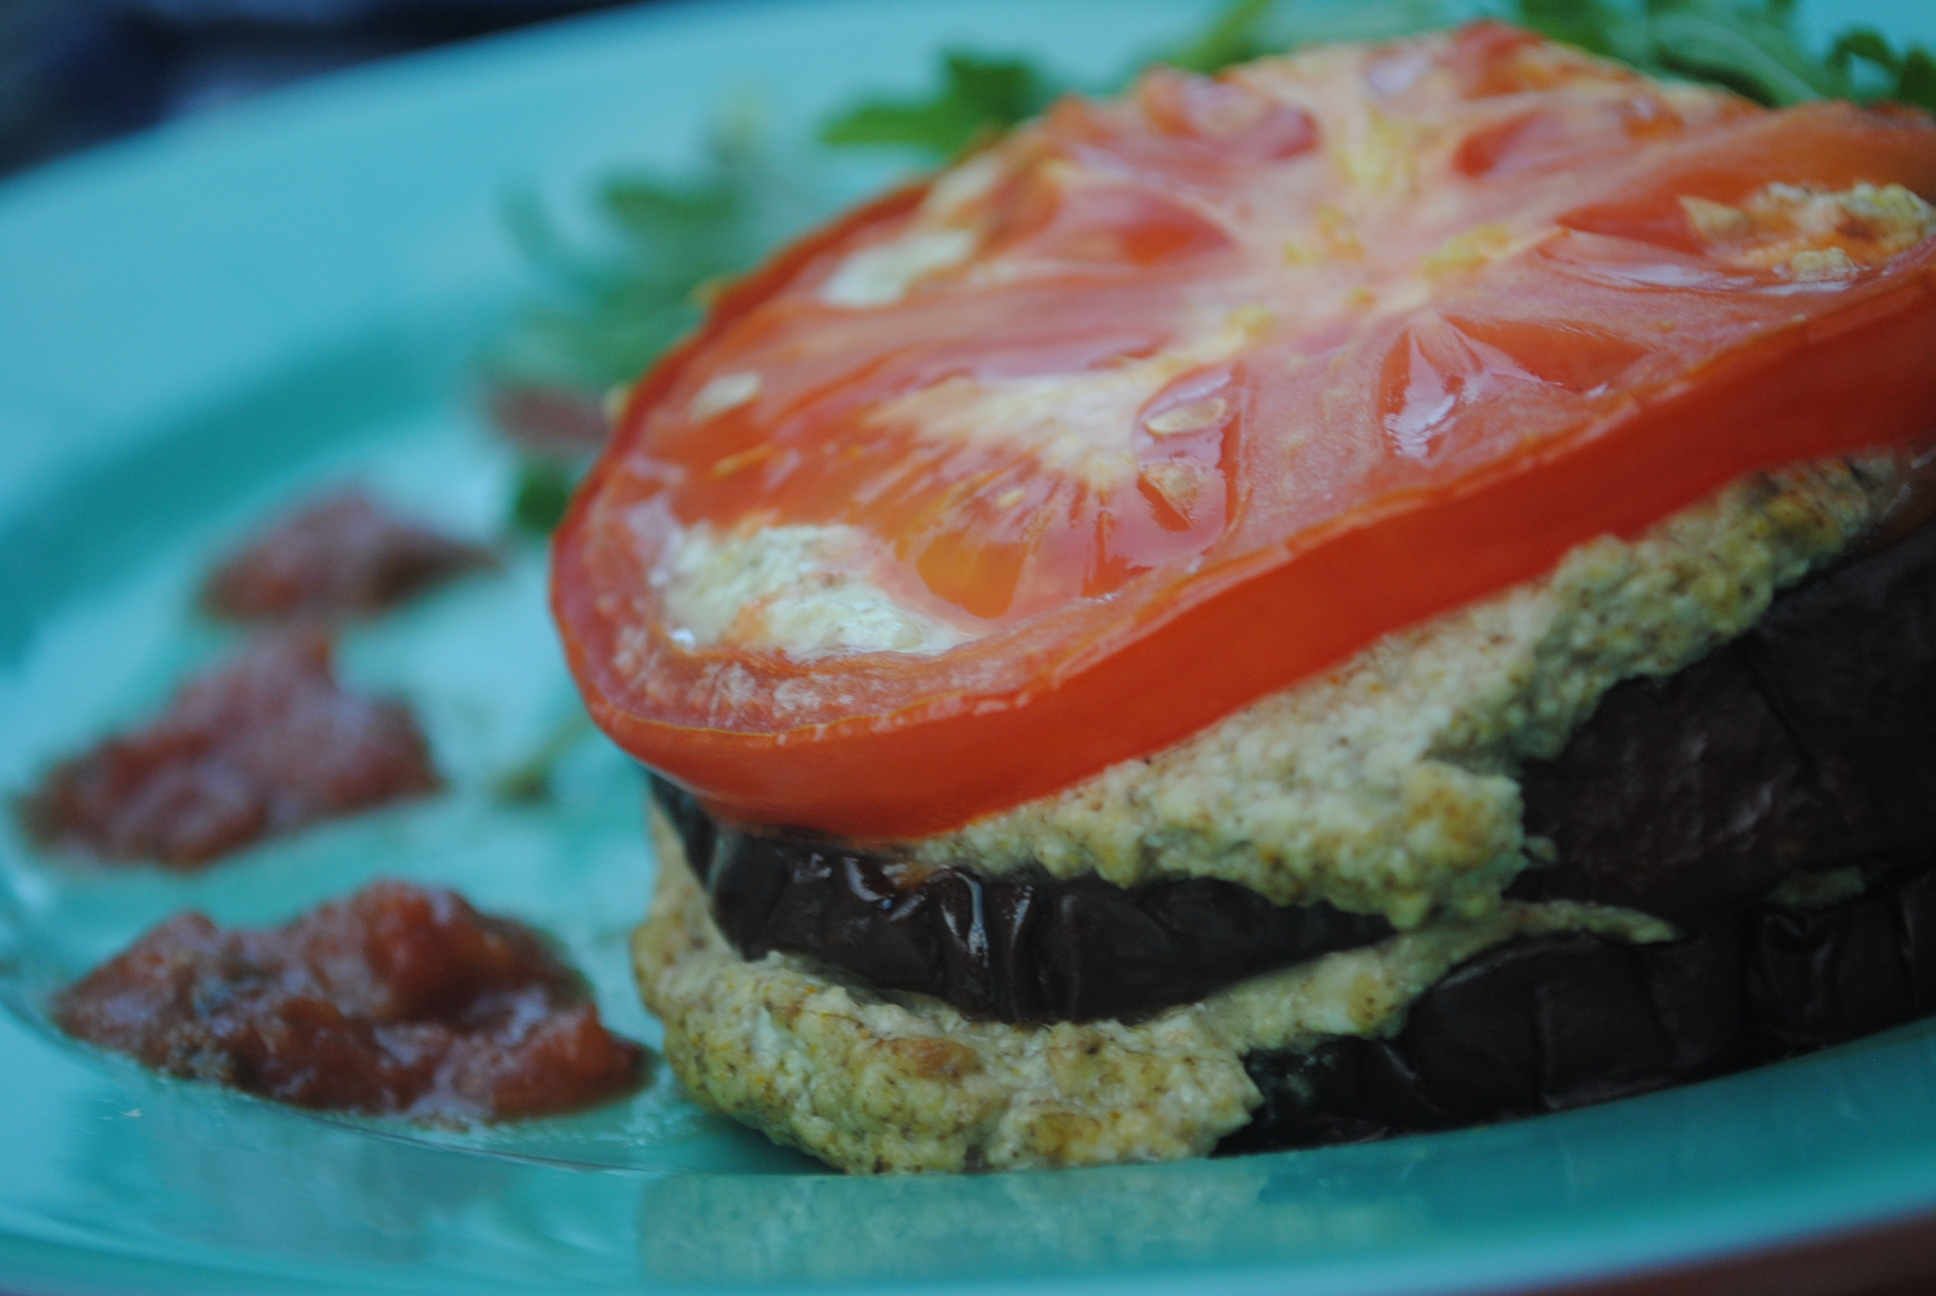 eggplant ricotta close up